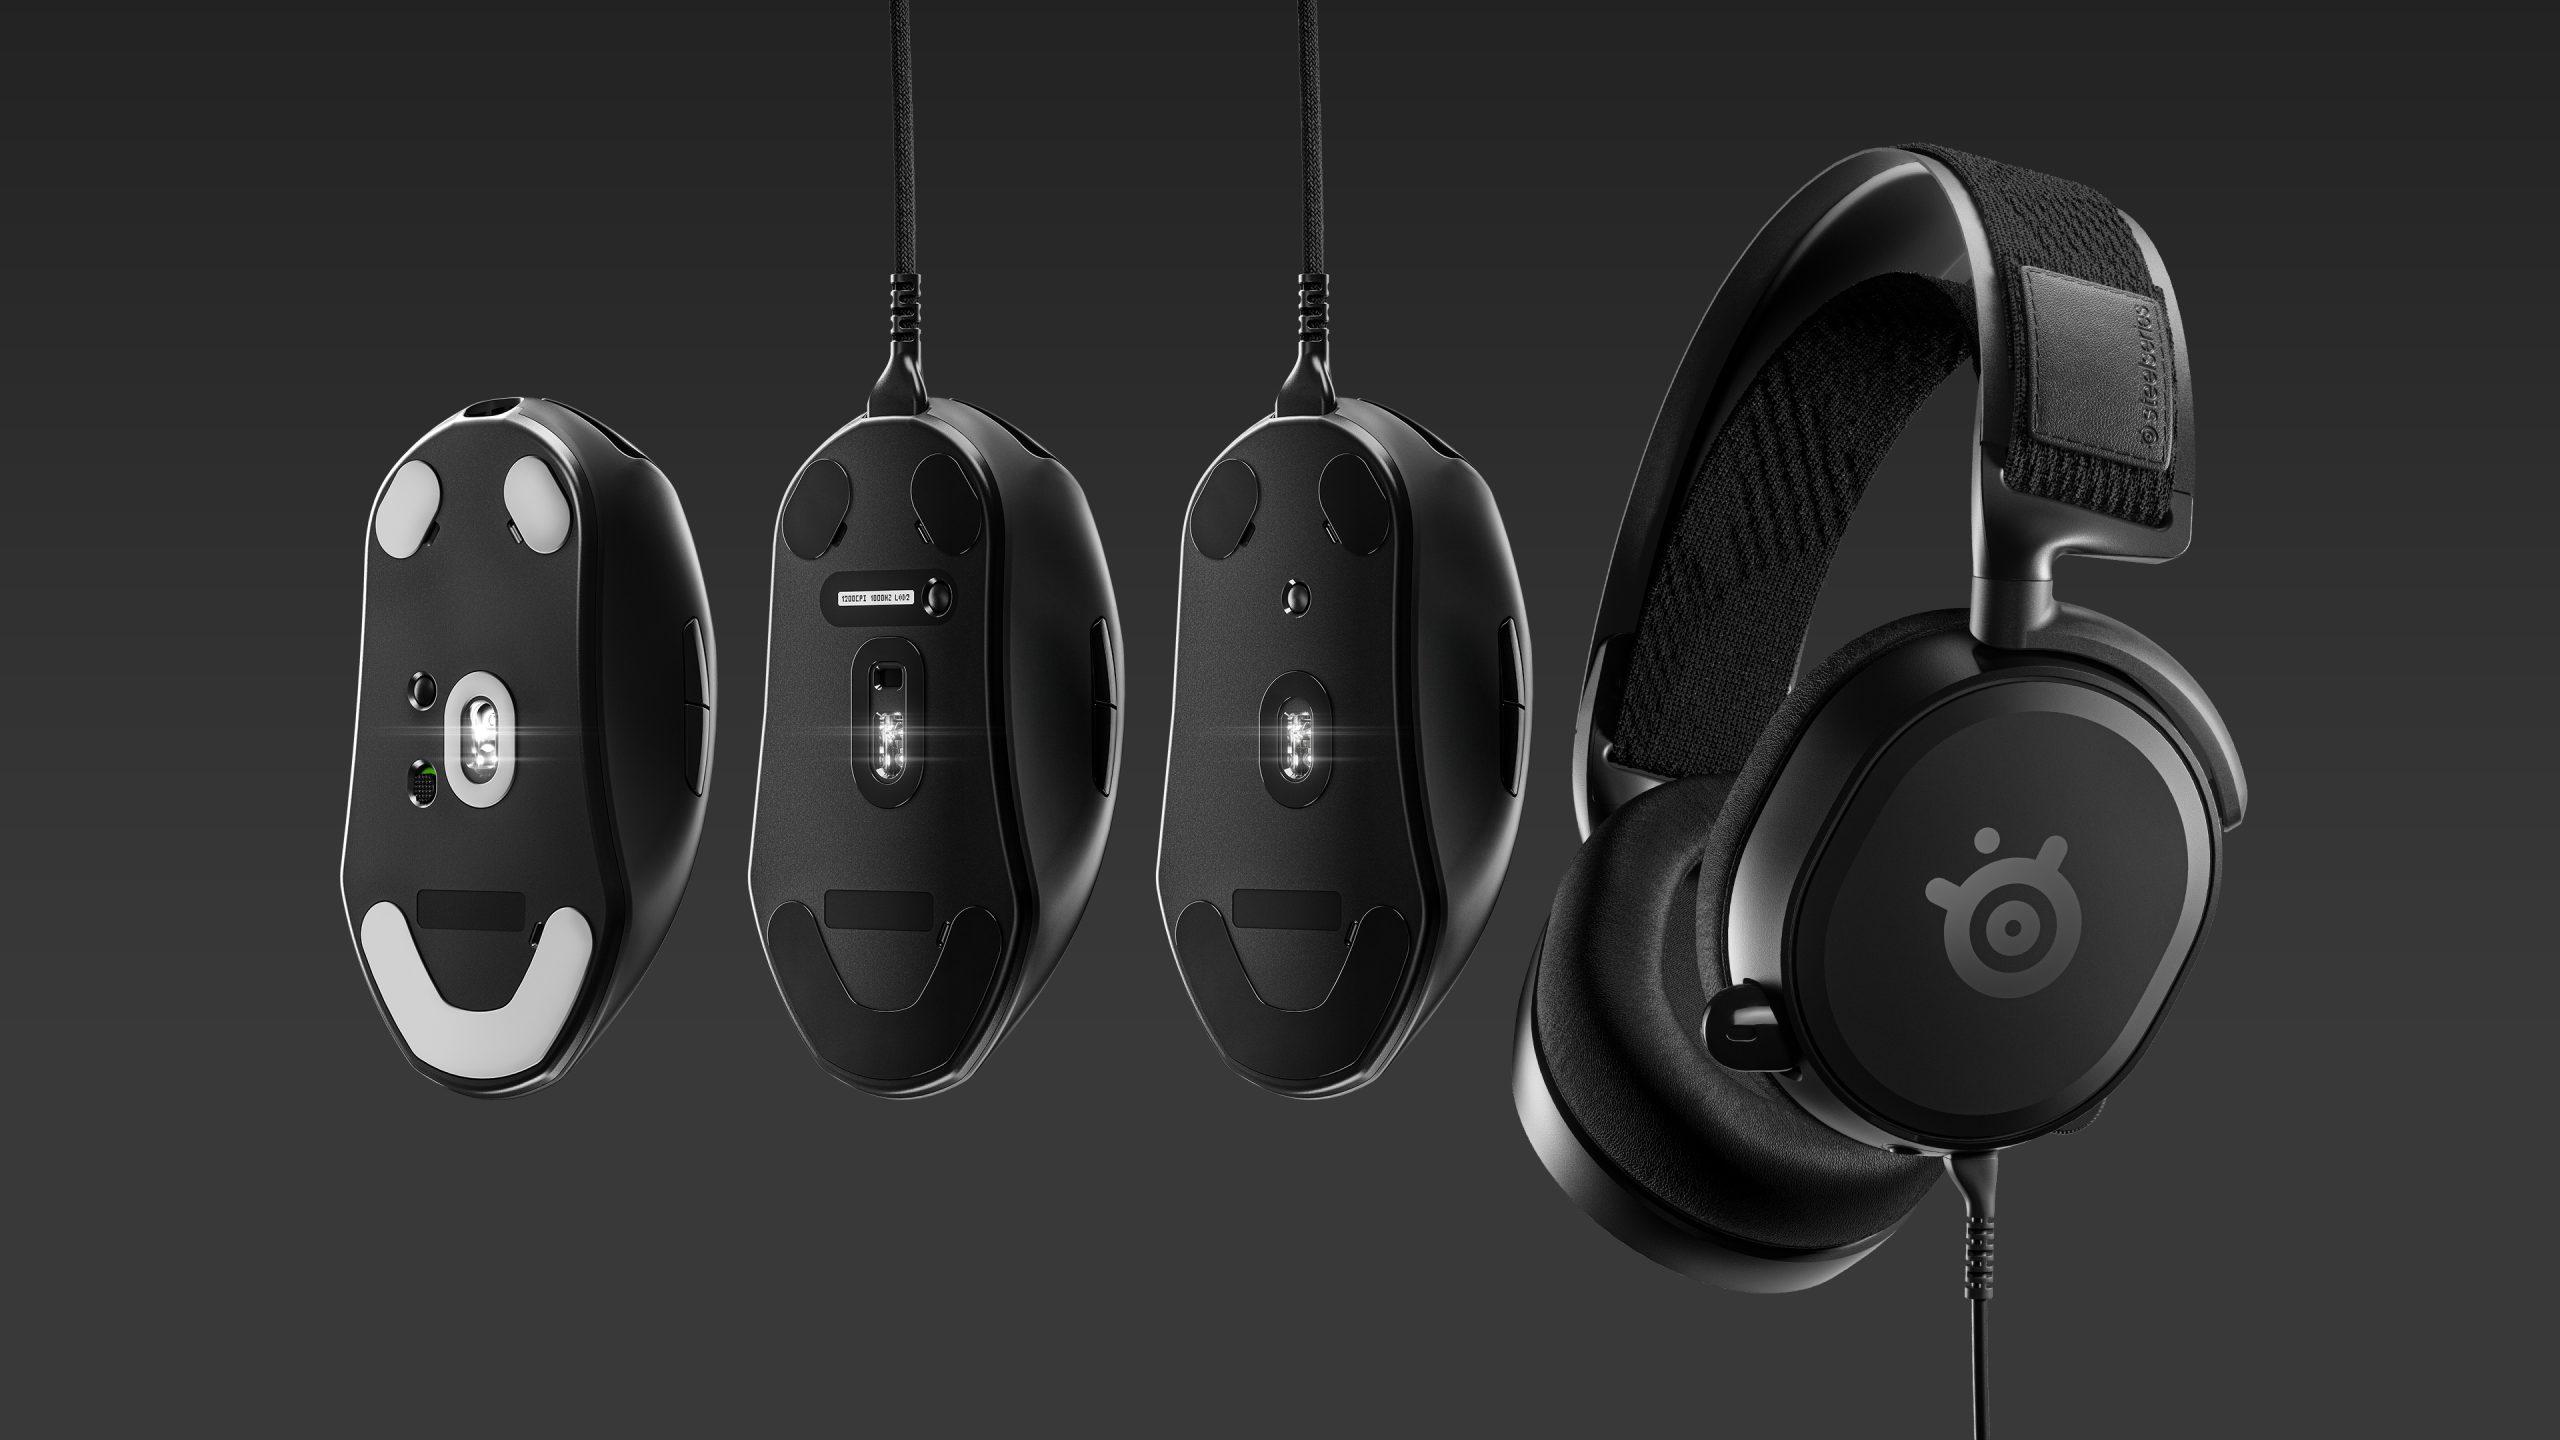 SteelSeries Prime 電競系列推出!滑鼠、耳機產品率先看